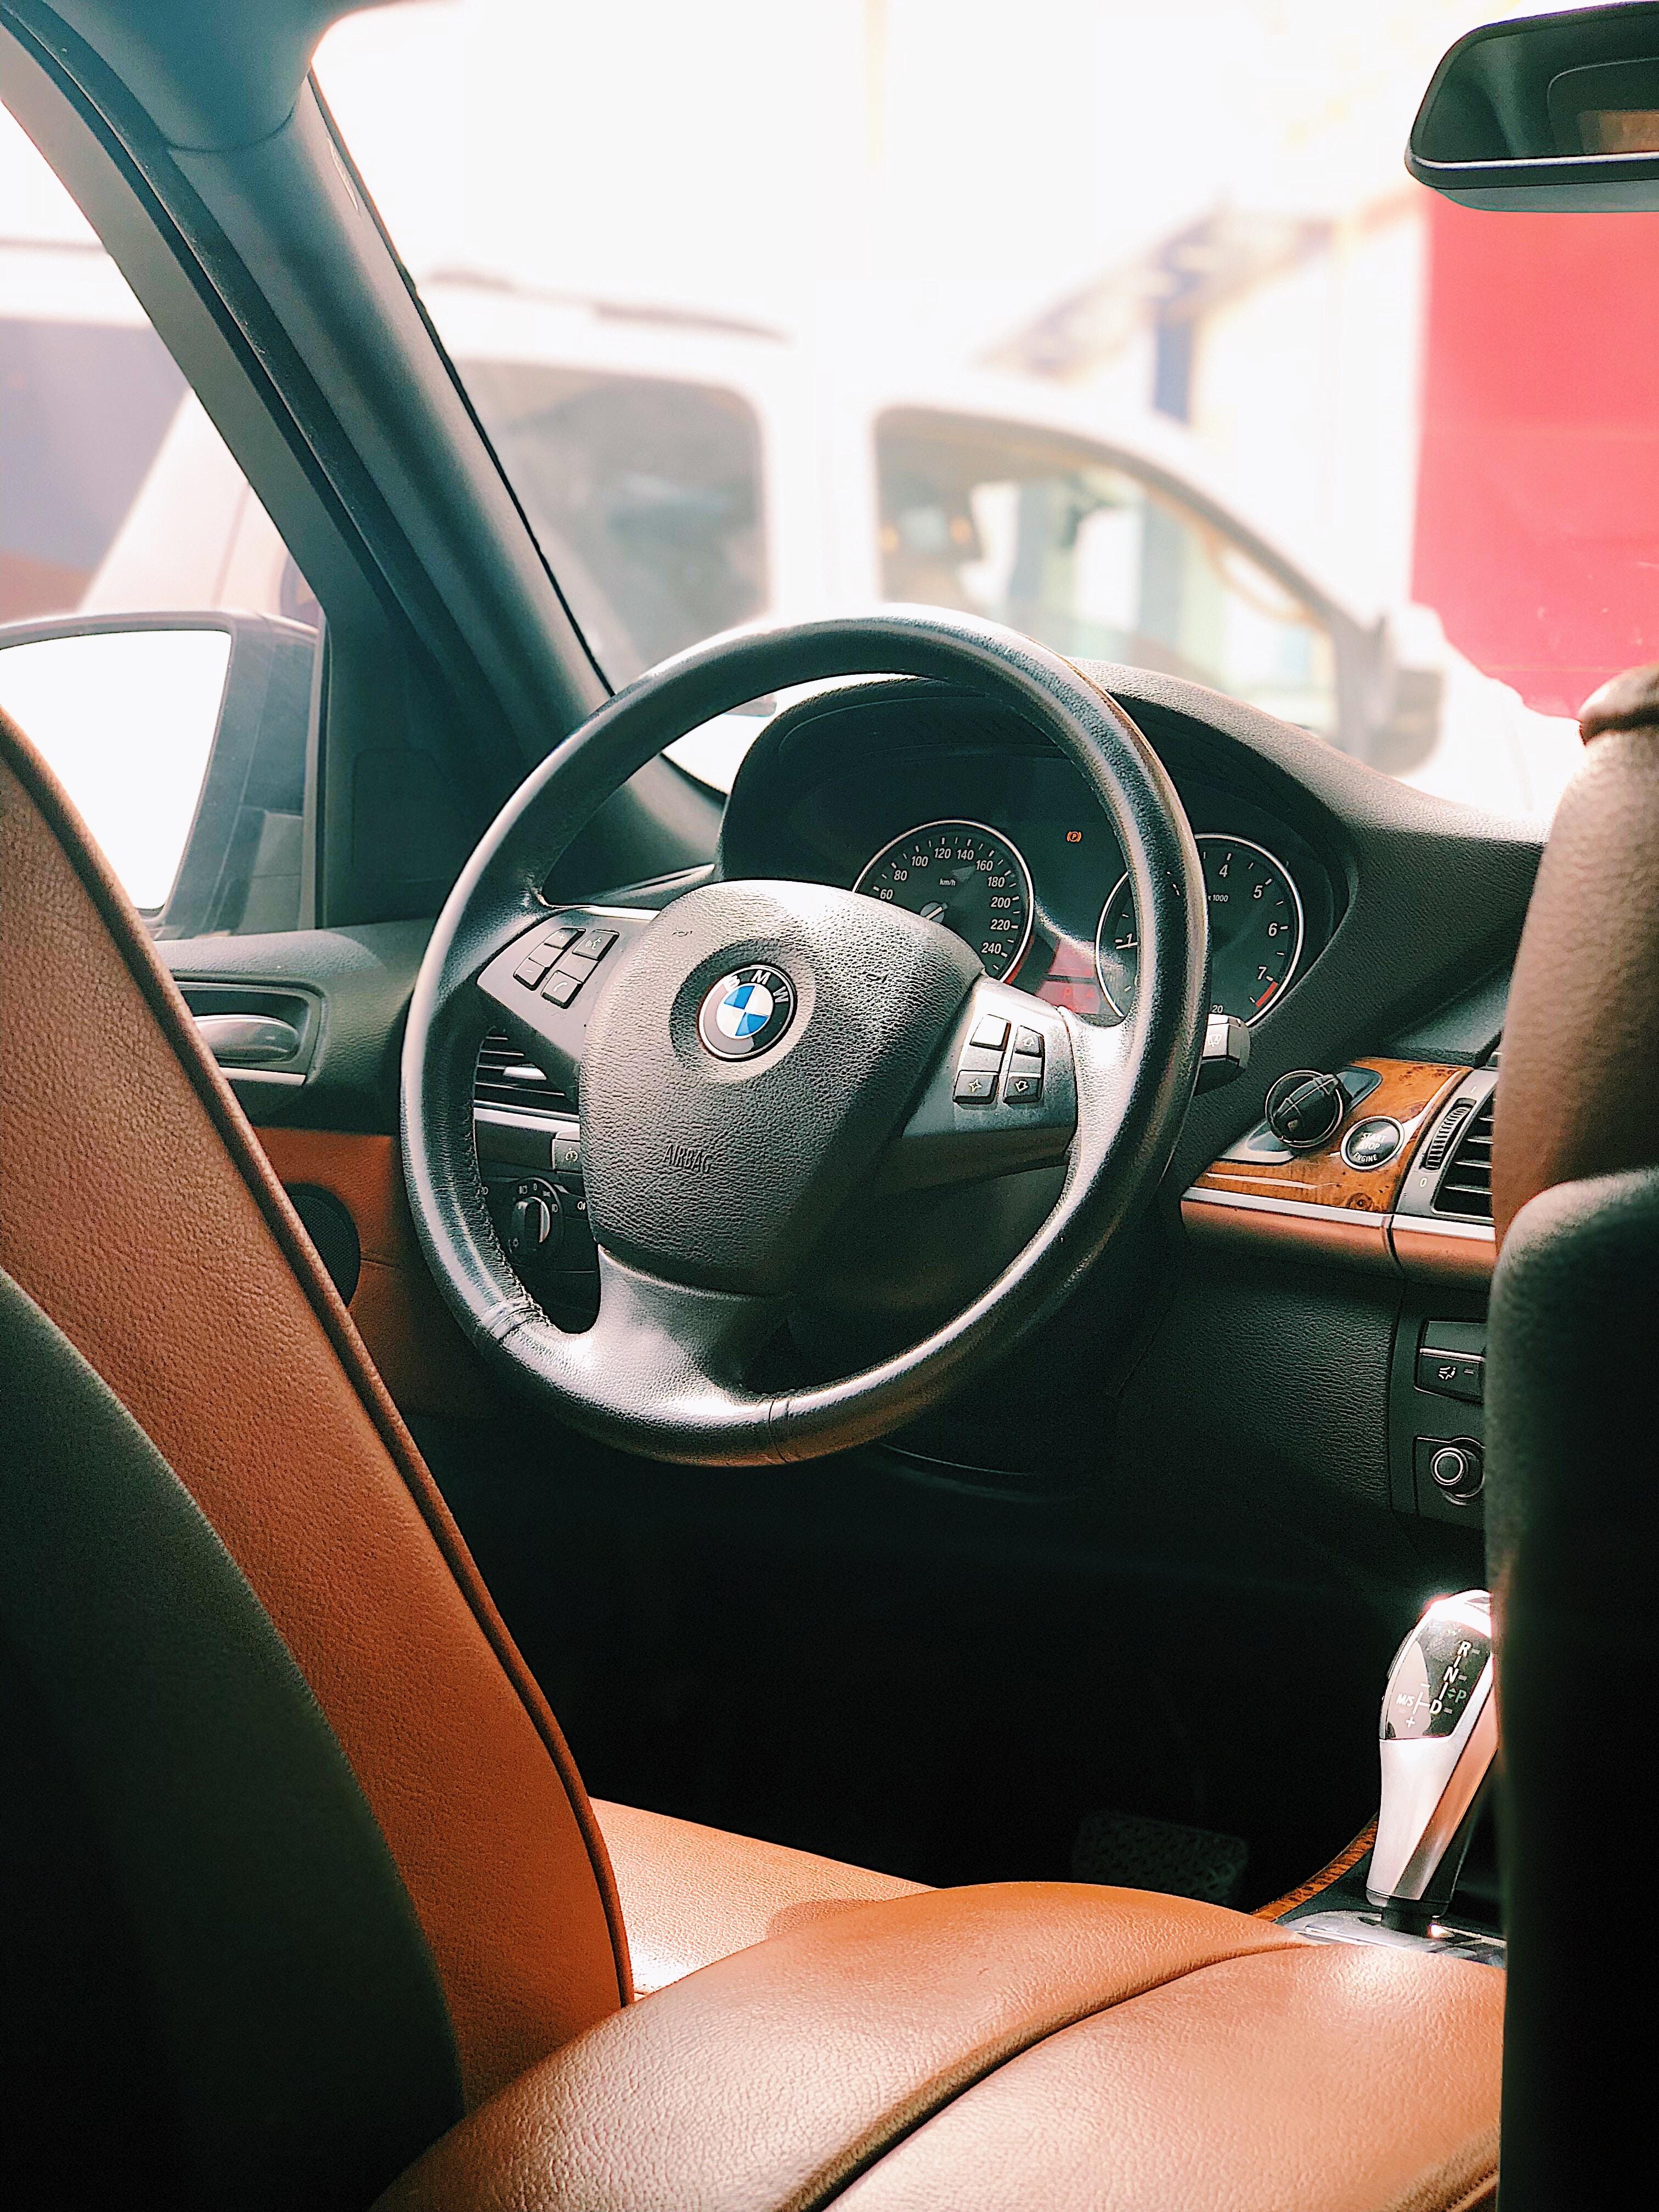 BMW vehicle interior near white van at daytime